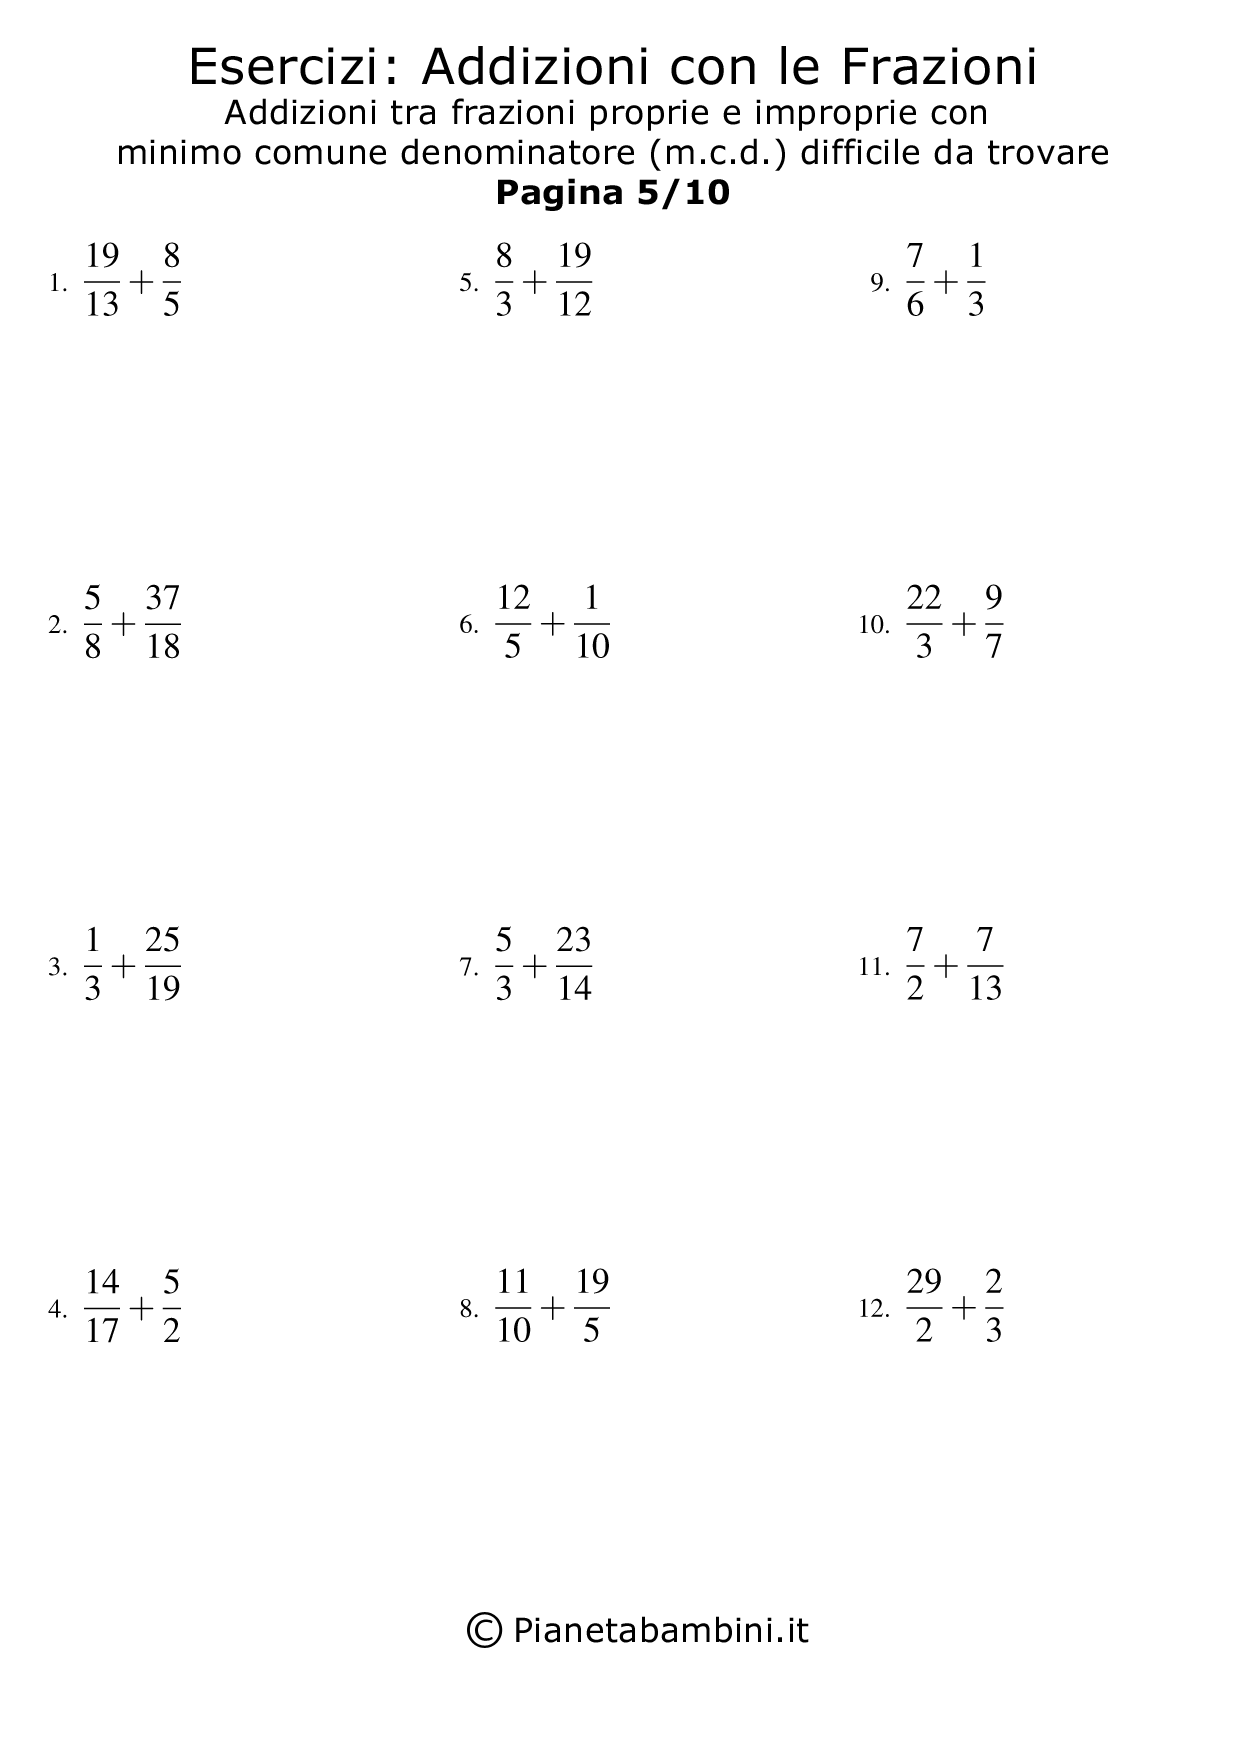 Frazioni-Proprie-Improprie-m.c.d-difficile_05